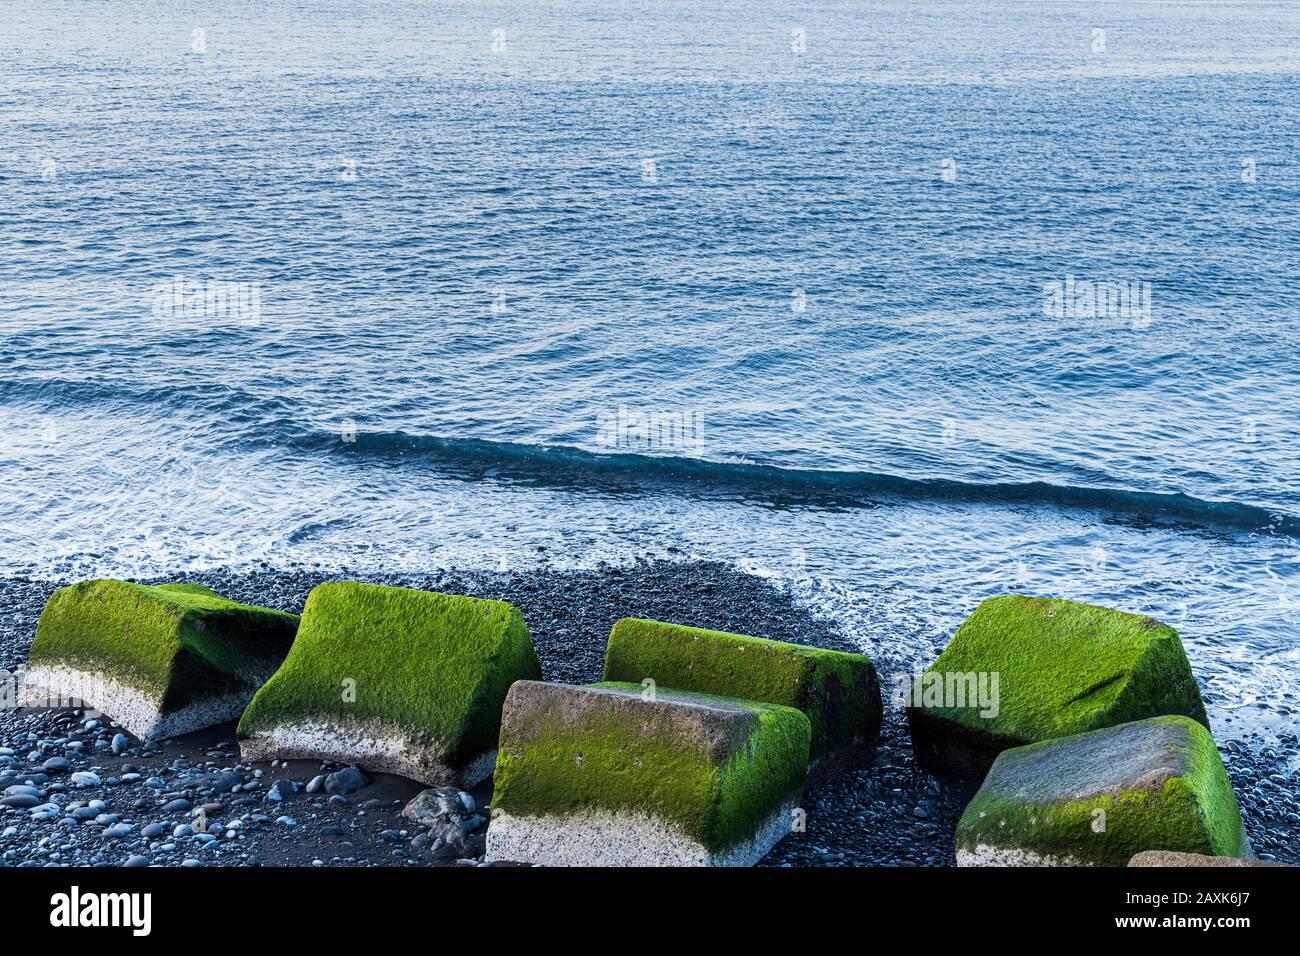 Green algae covered concrete blocks on a stony beach in Playa San Juan, Tenerife, Canary Islands, Spain Stock Photo